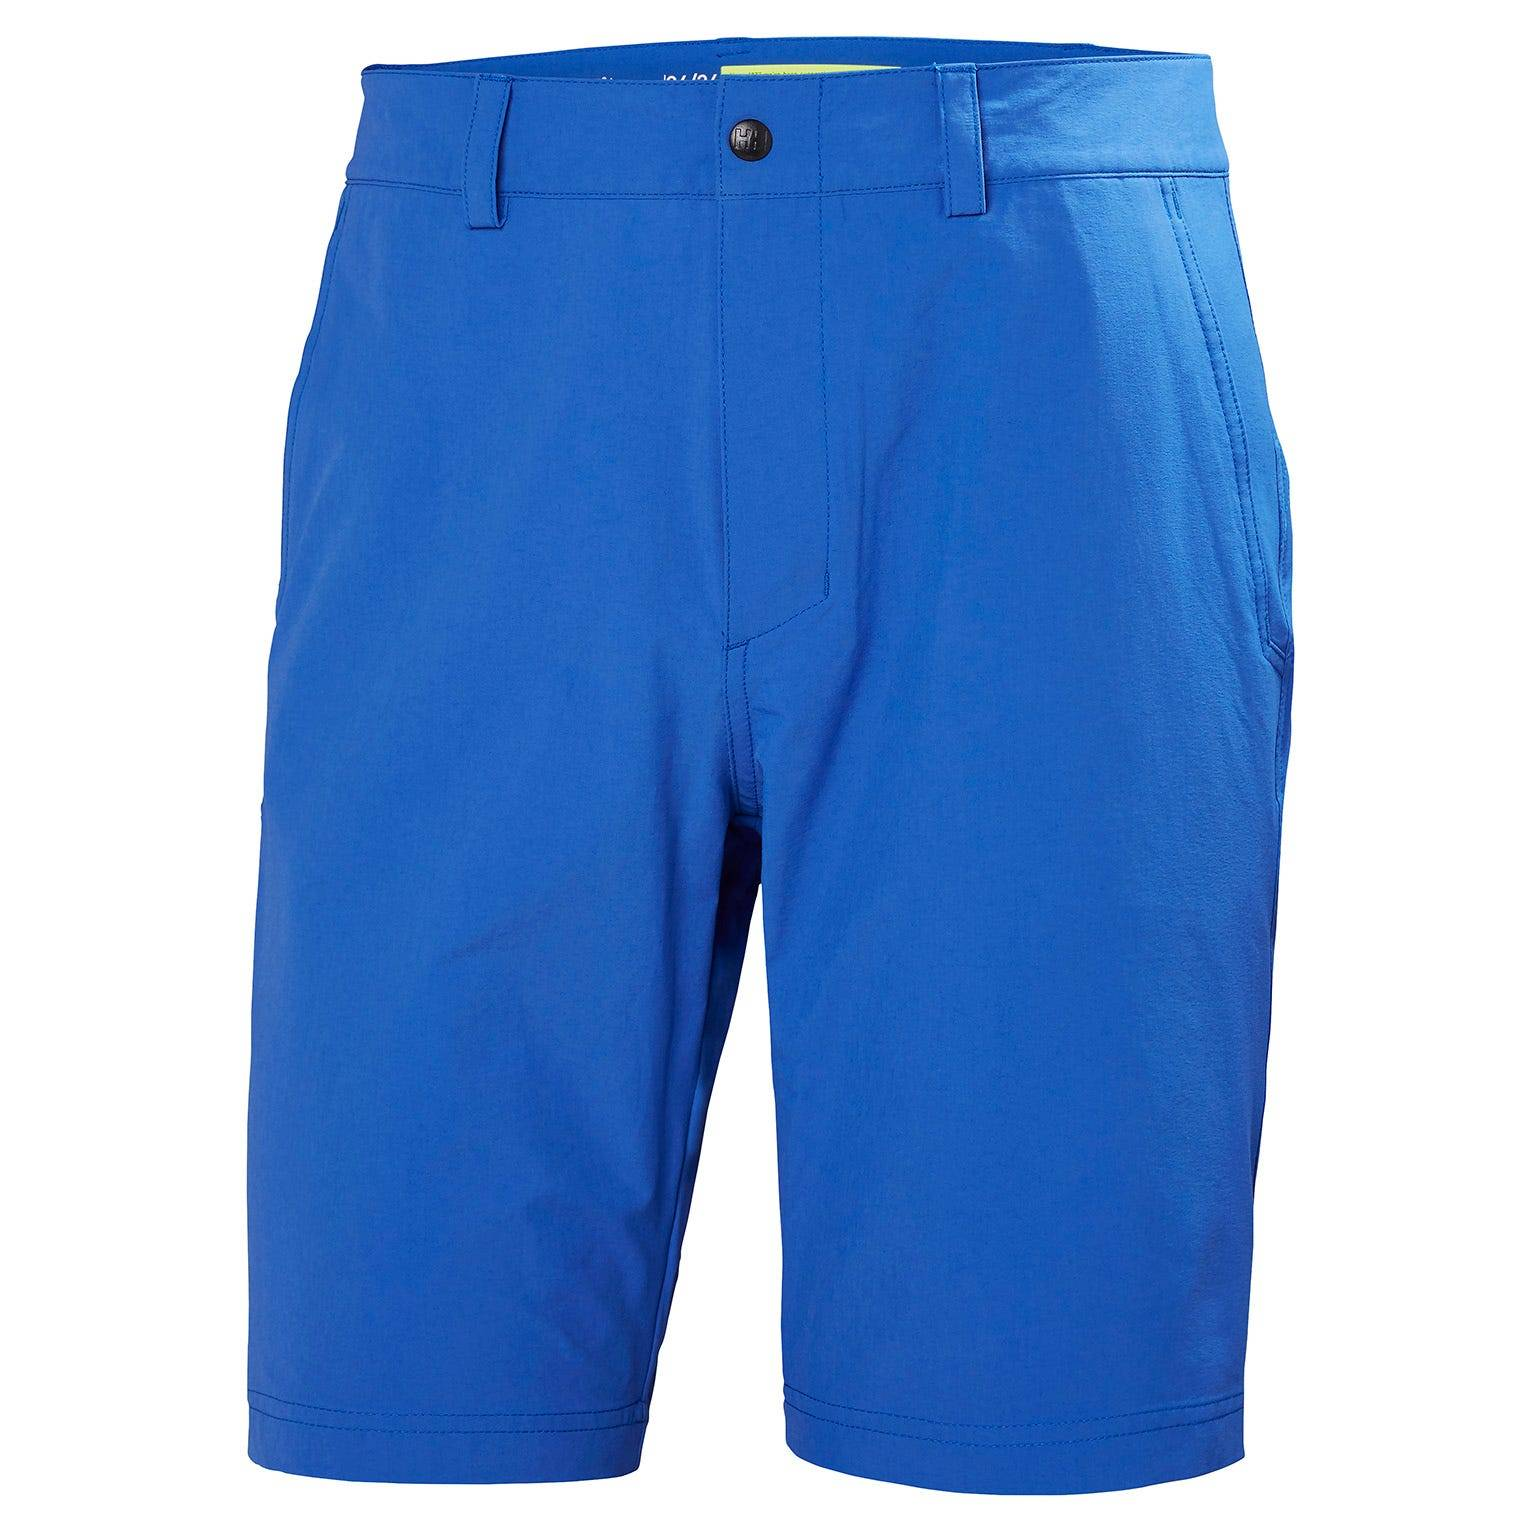 "Helly Hansen Hp Qd Club Shorts 10"" Mens Sailing Pant Blue 38"